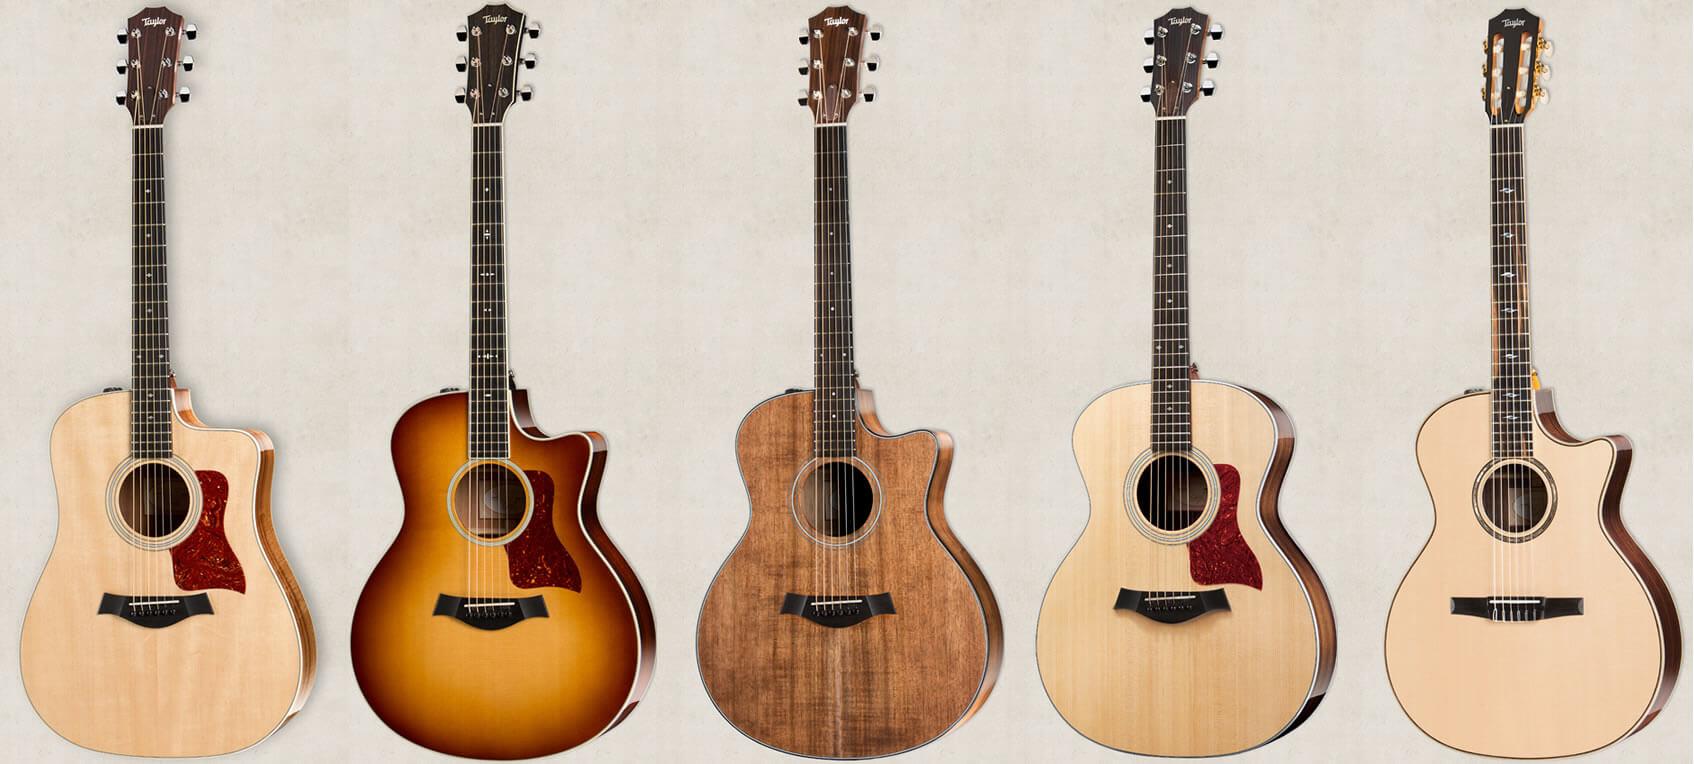 Taylor(テイラー)のアコースティックギター